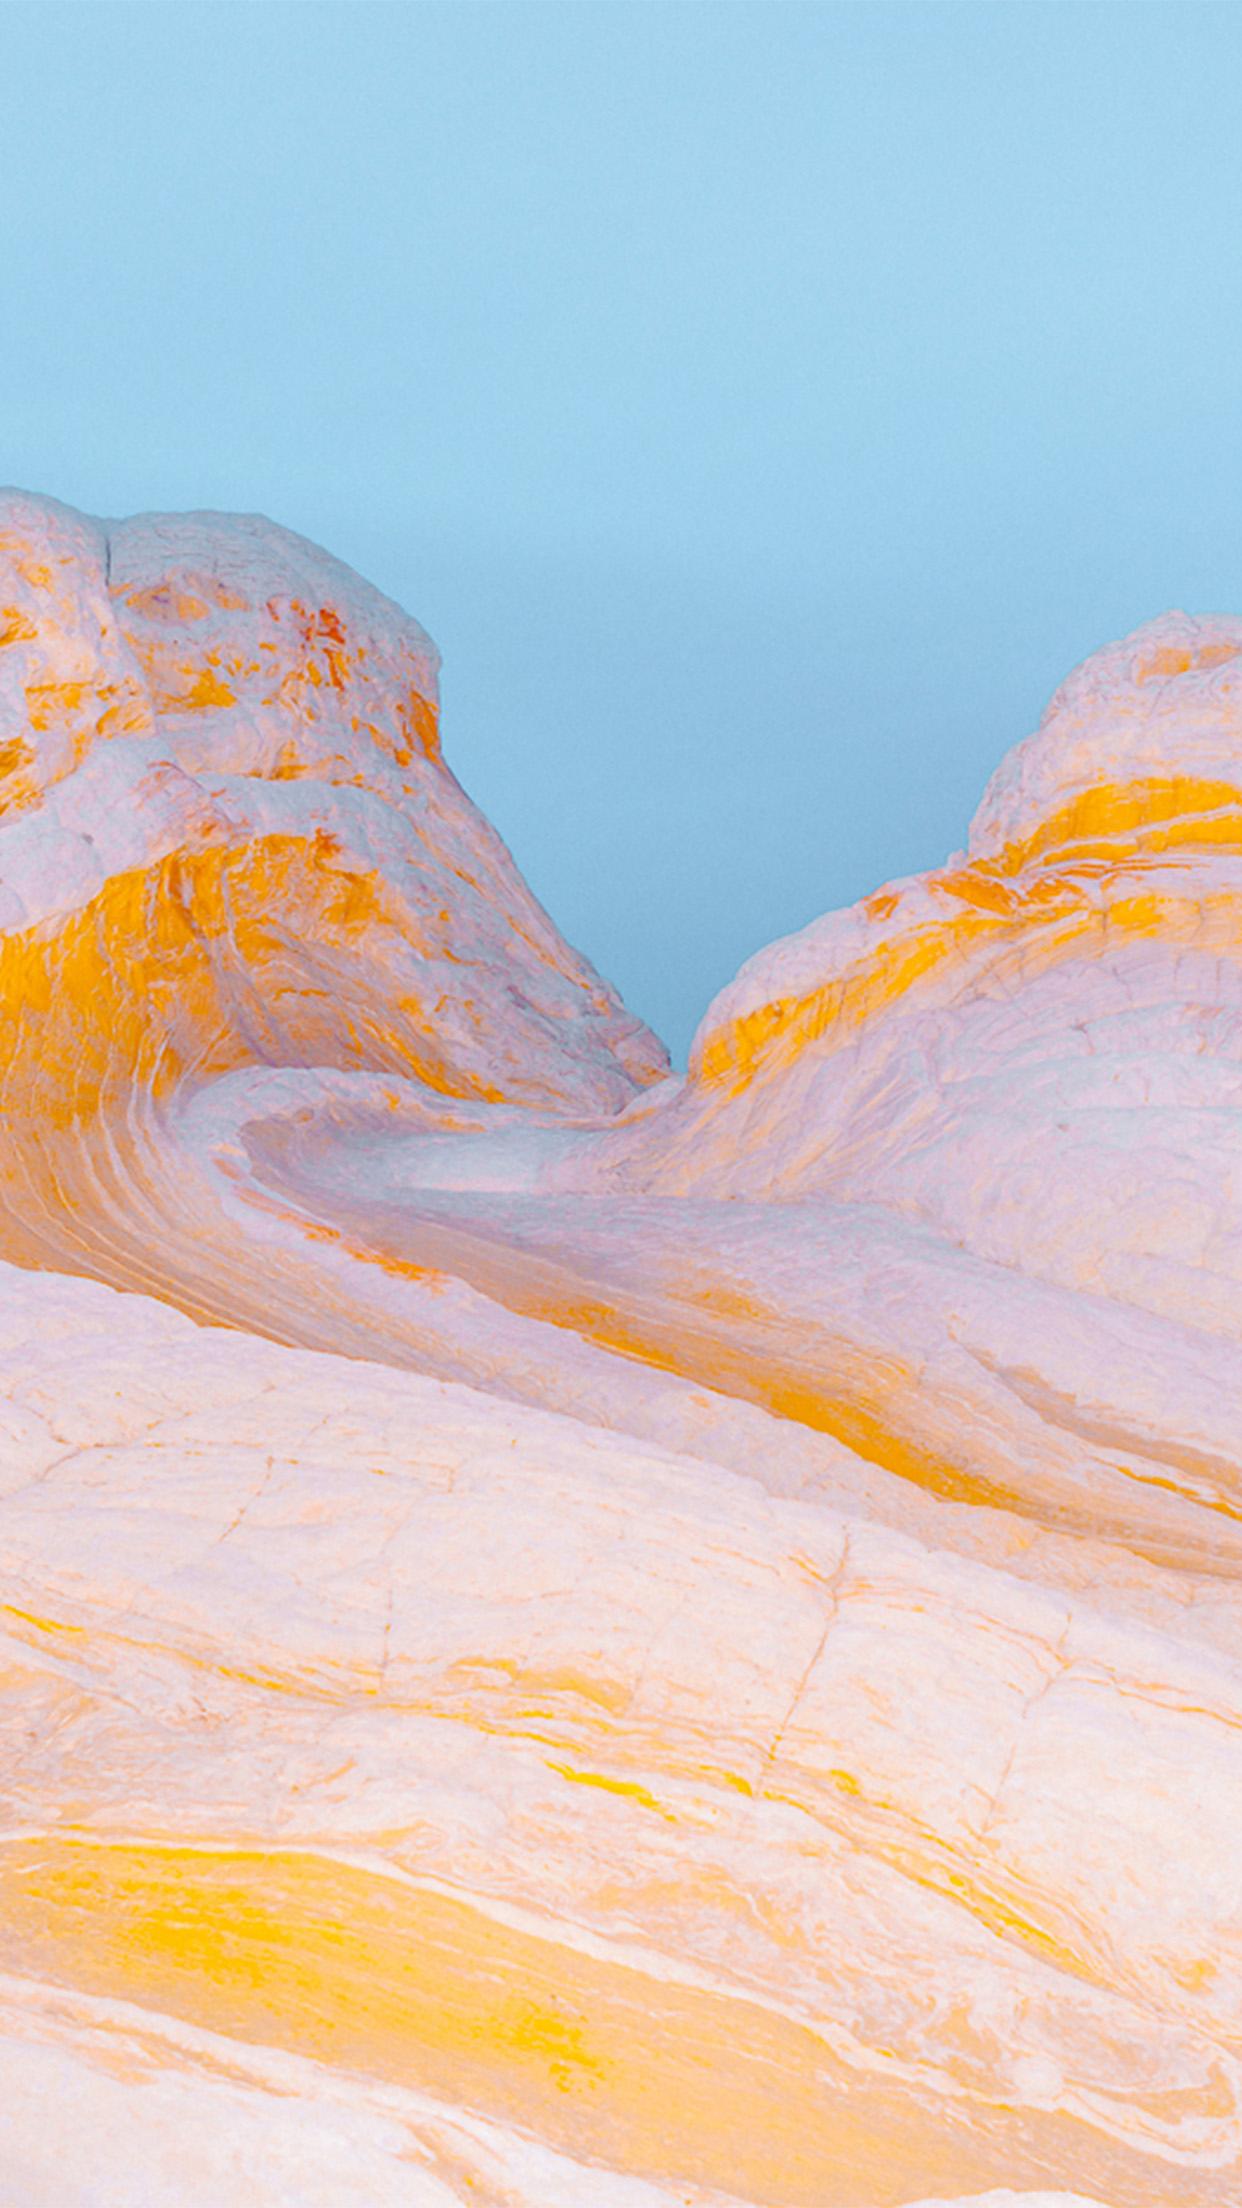 Cute Hd Wallpapers For Phone Vz29 Mountain Yellow Weird Pattern Background Wallpaper